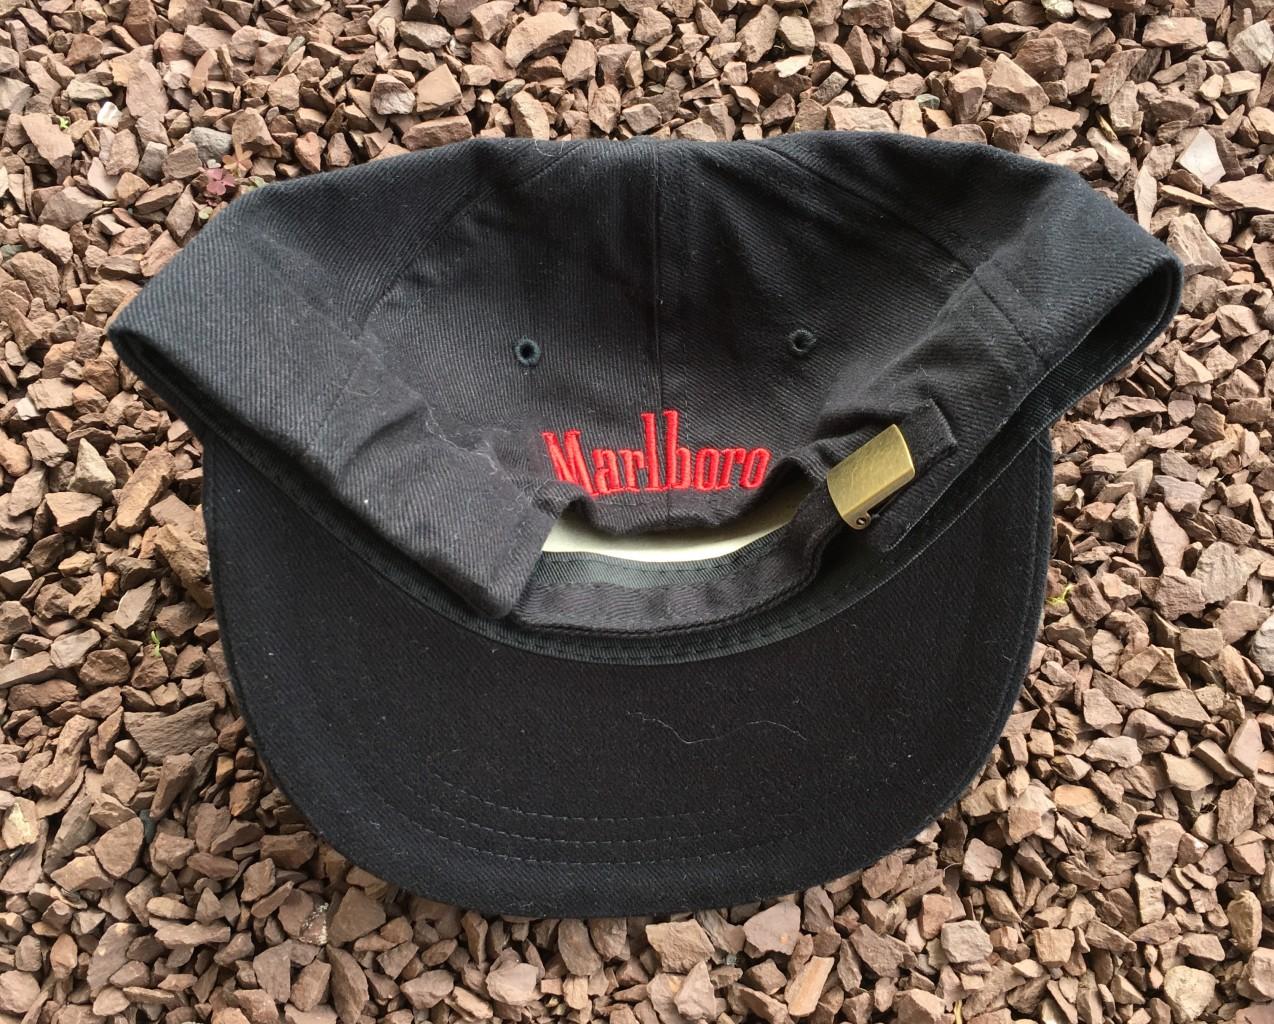 3f72b32ac0f47 Vintage 90 s Marlboro Cigarette Dad hat. 90 s Marlboro Dad hat